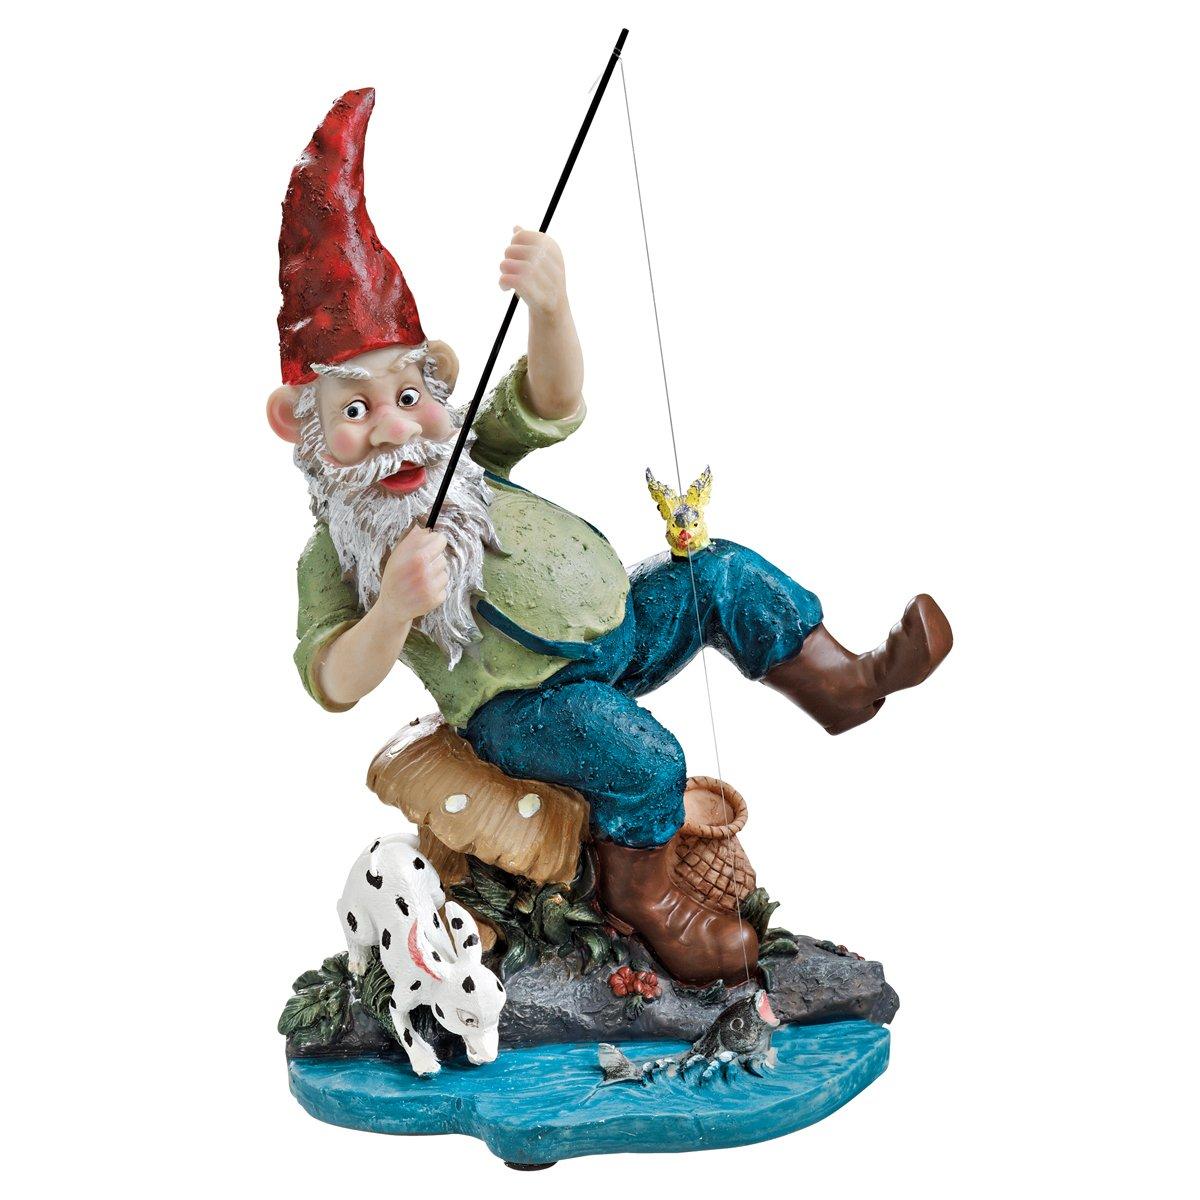 Garden Gnome Statue - Gone Fishing Garden Gnome - Outdoor Garden Gnomes - Funny Lawn Gnome Statues